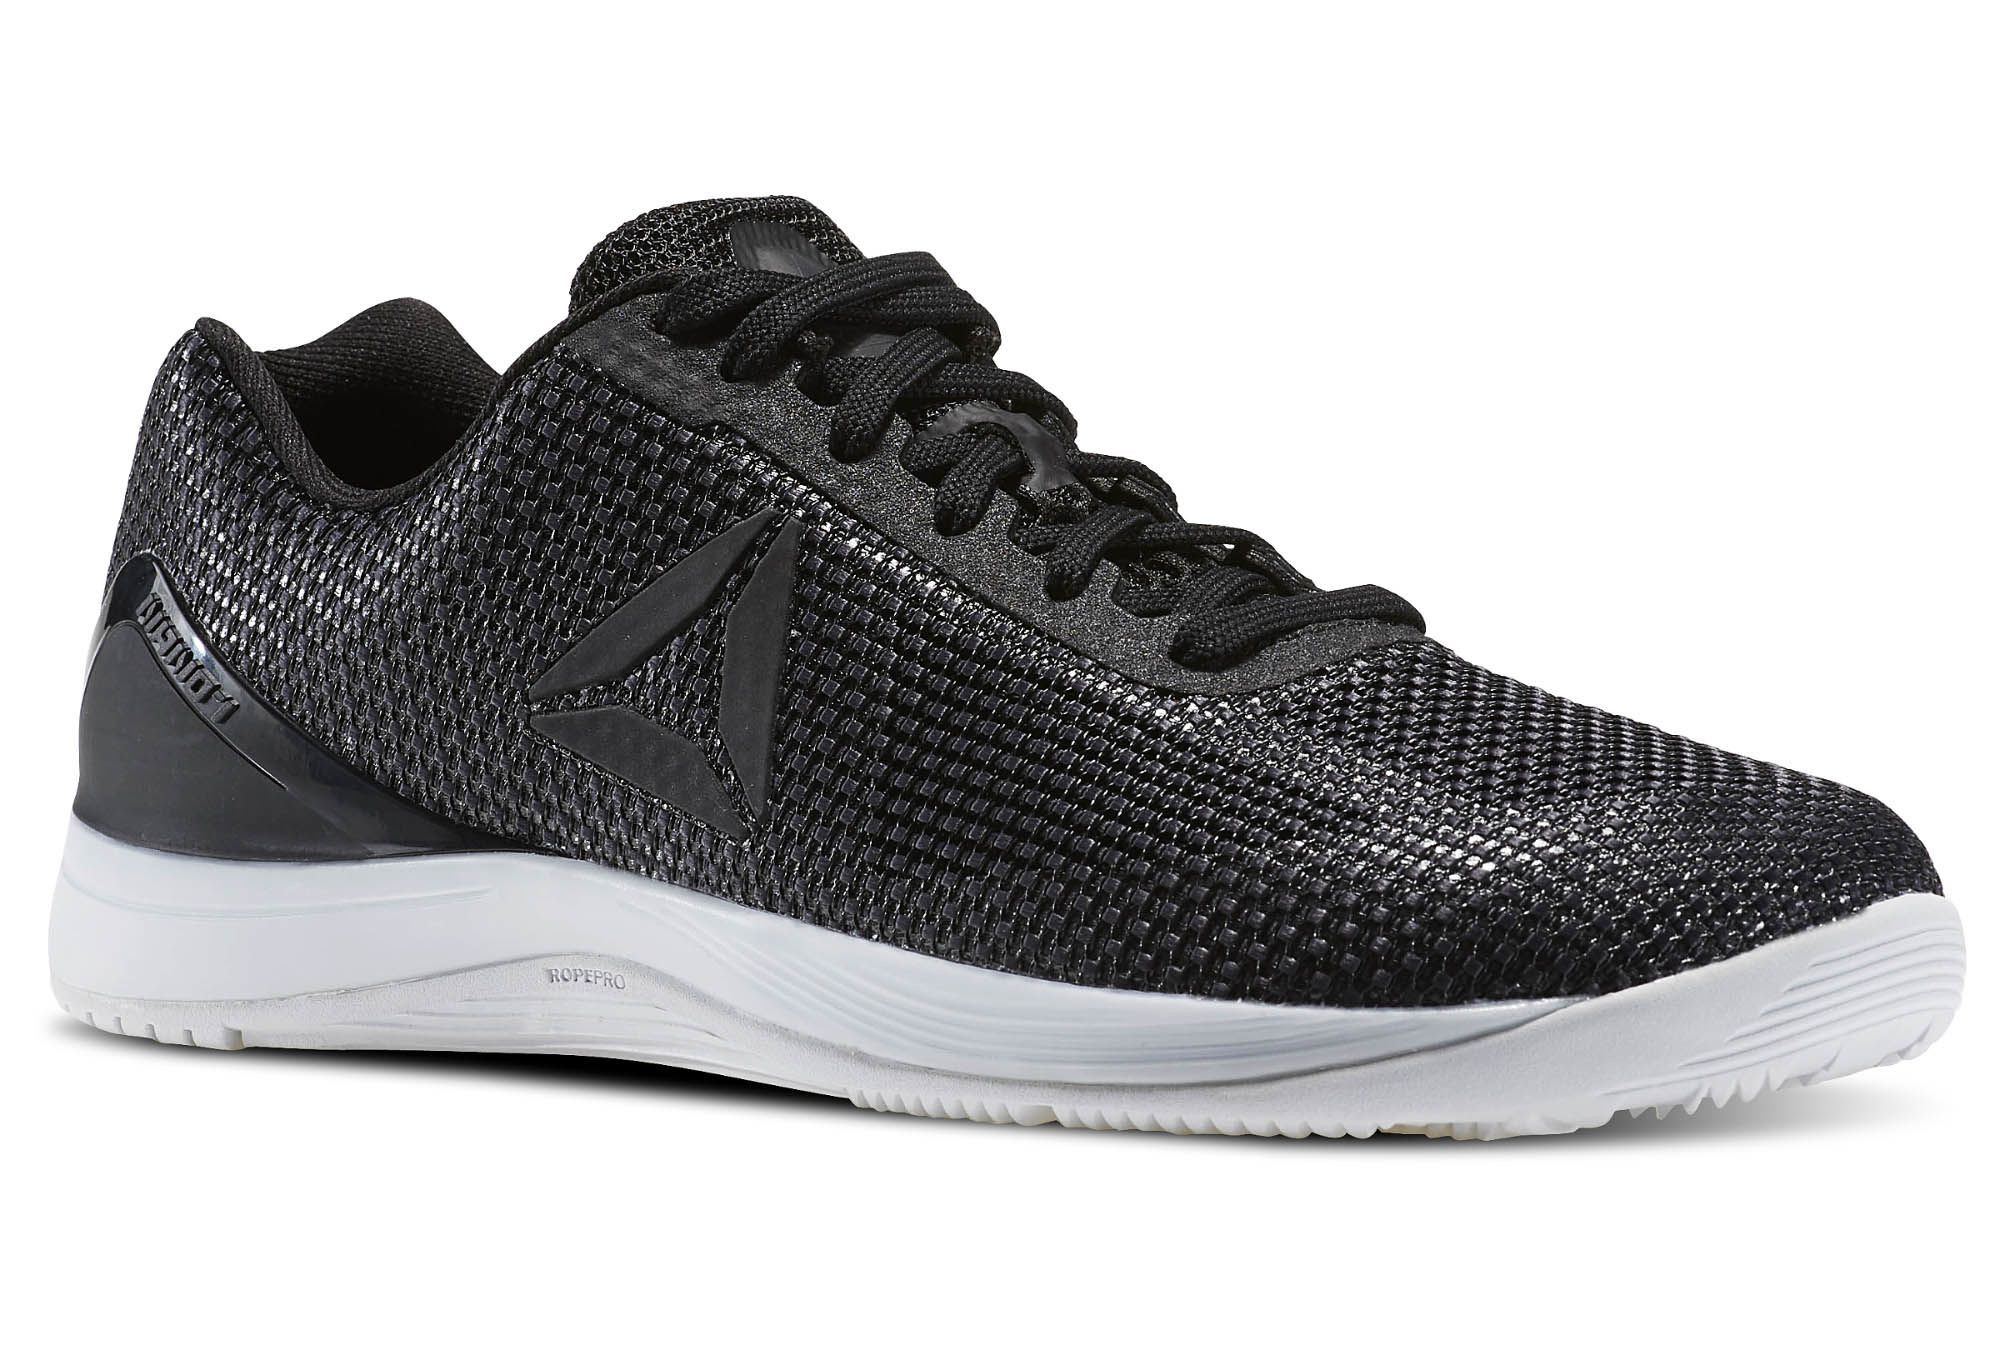 Crossfit 7 Cross Reebok De 0 Training Chaussures Noir Nano qHwIAYC